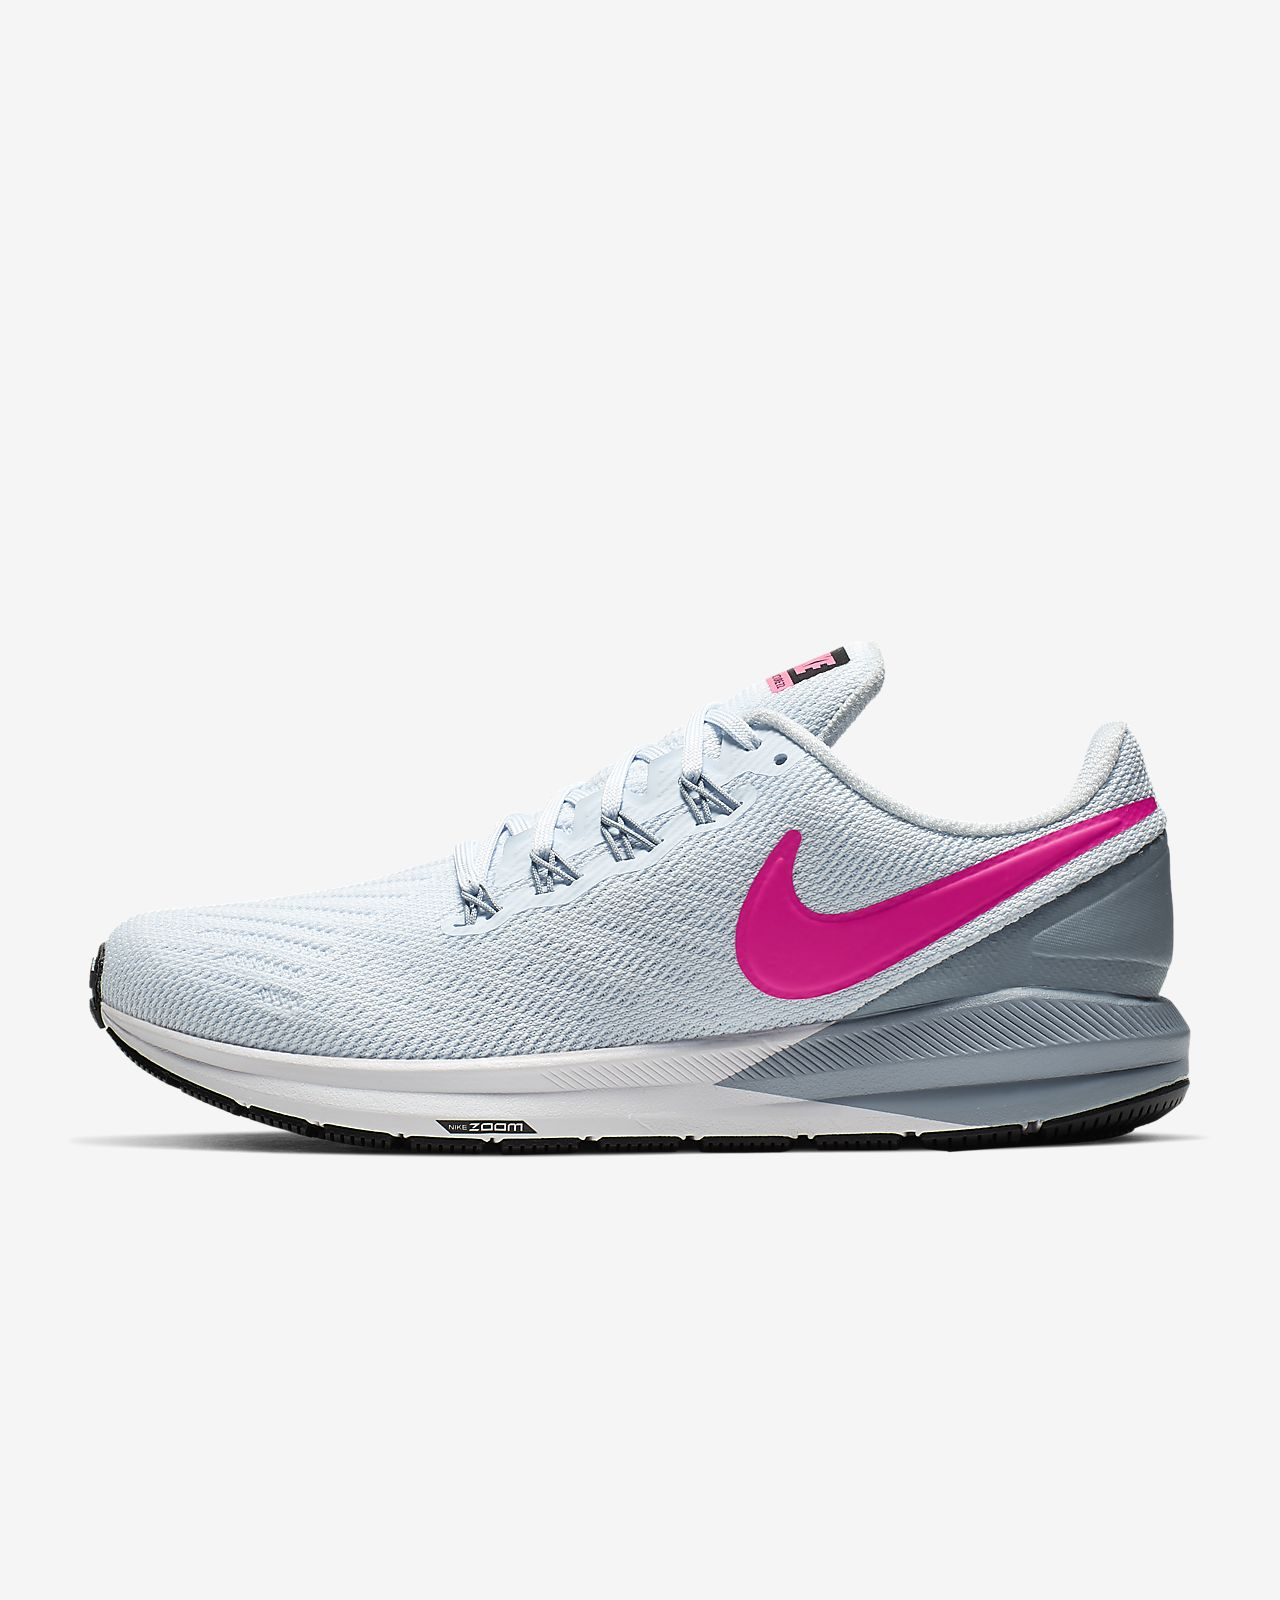 brand new 03505 dc635 Nike Air Zoom Structure 22 Women's Running Shoe